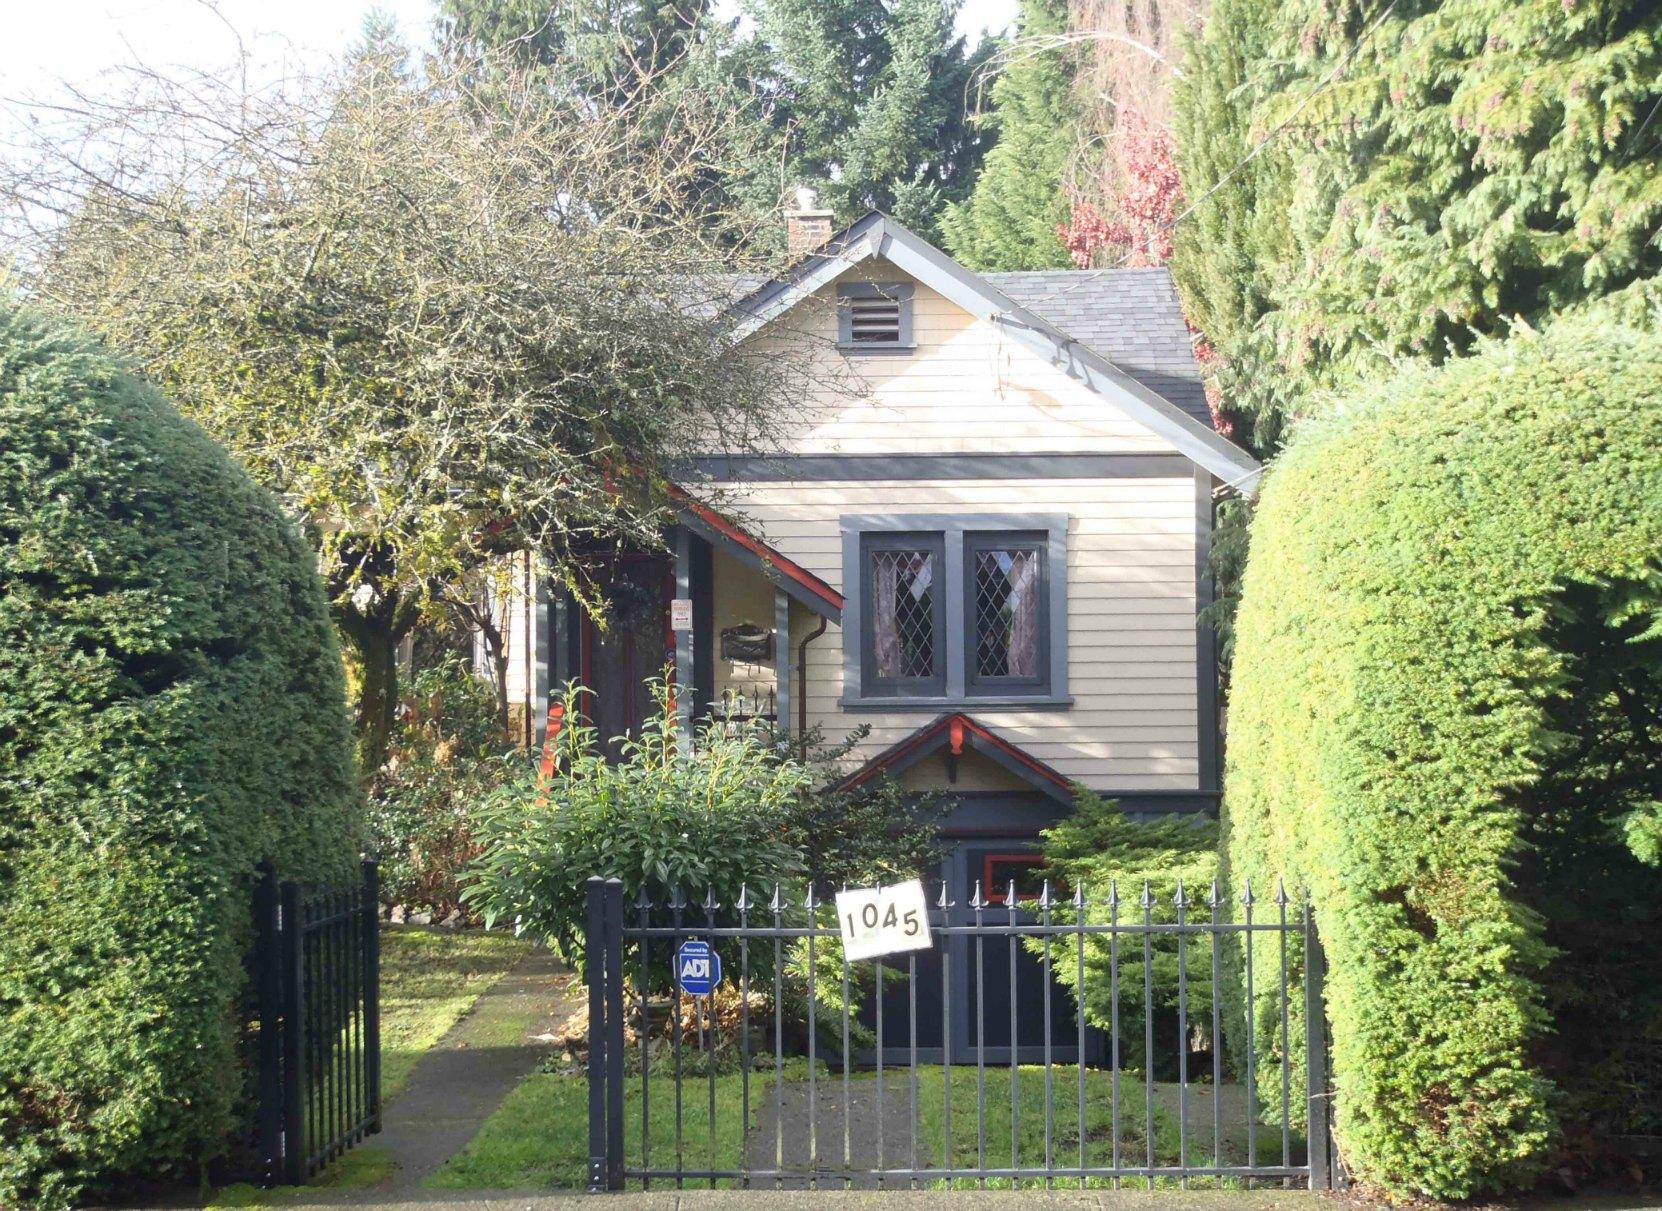 1045 Holmes Street, Duncan, B.C.